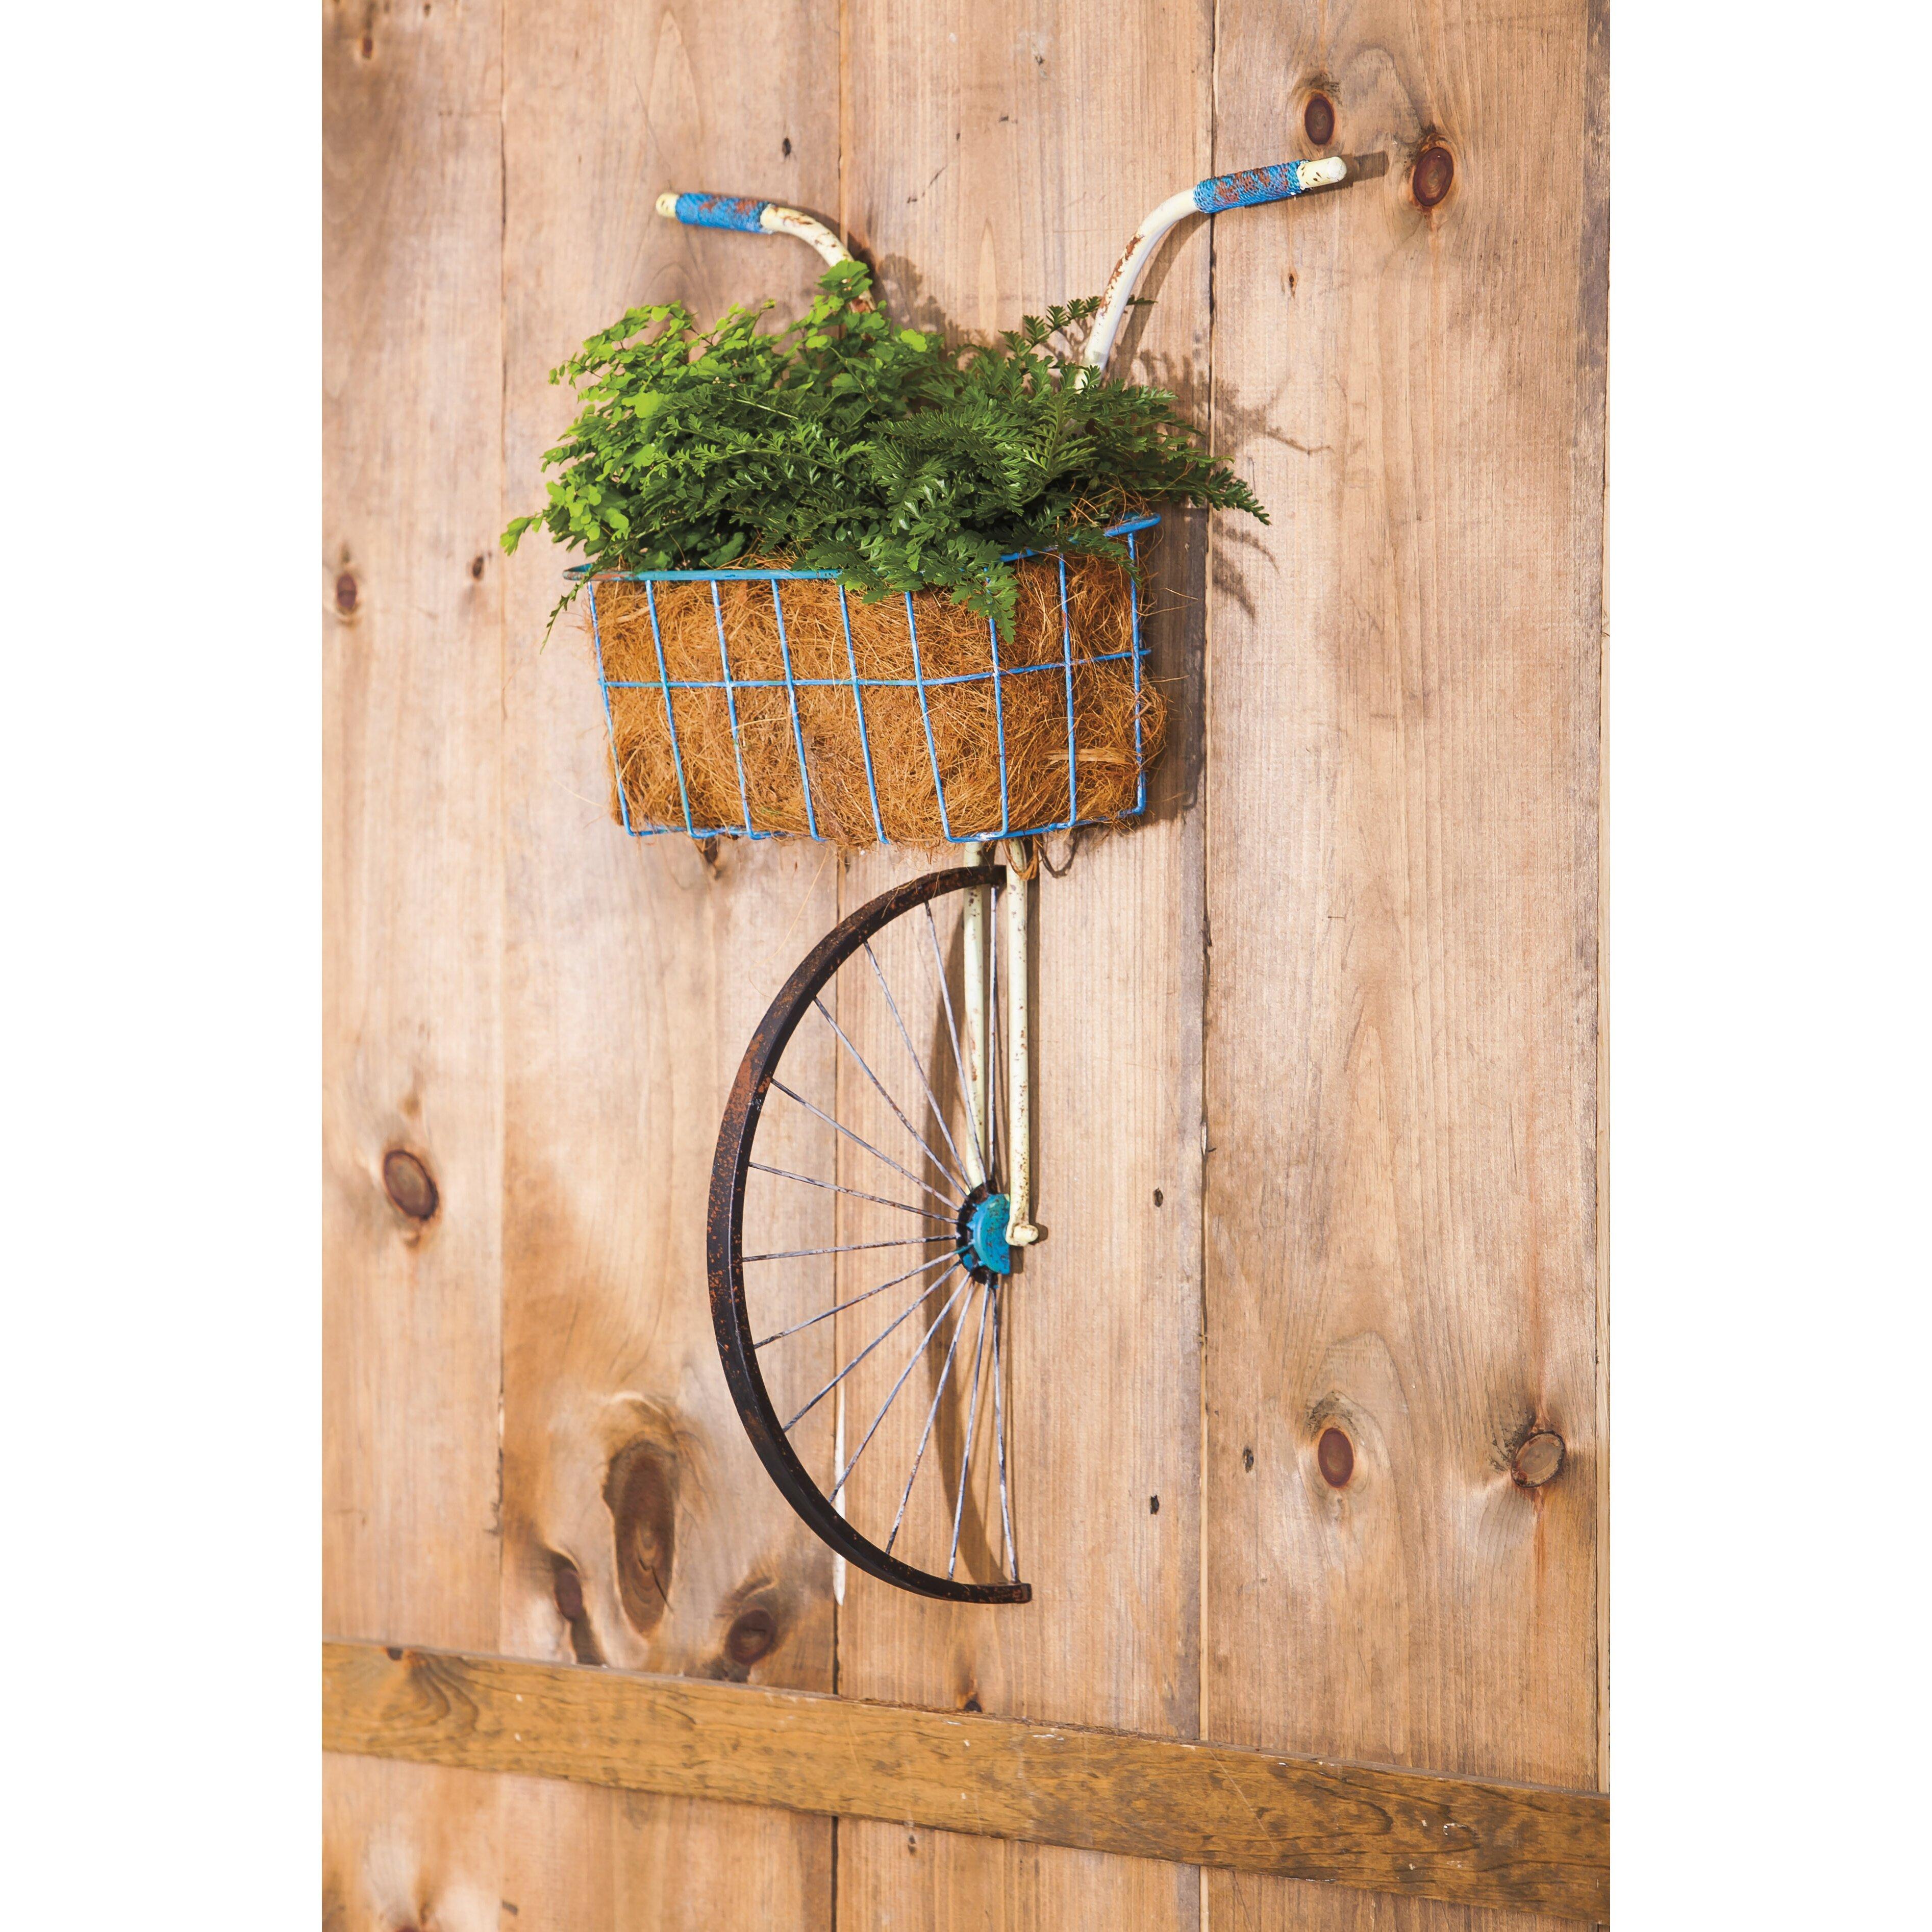 Wall Art Metal Bicycle : Front basket metal bicycle and planter wall decor wayfair